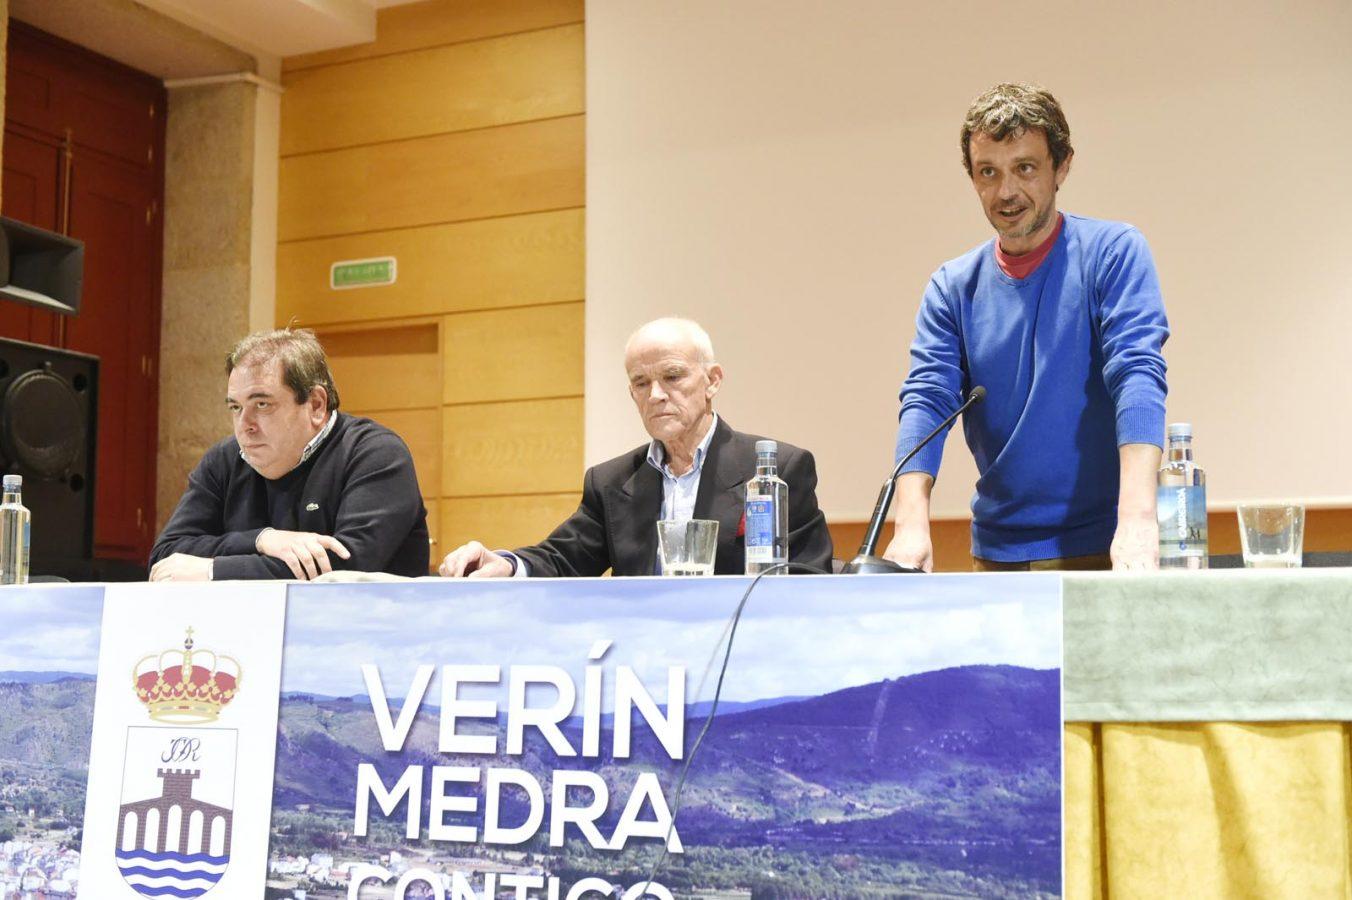 O alcalde de Verín, Gerardo Seoane, o relator Manuel Mandianes e o coordinador das xornadas, Bruno Rúa.